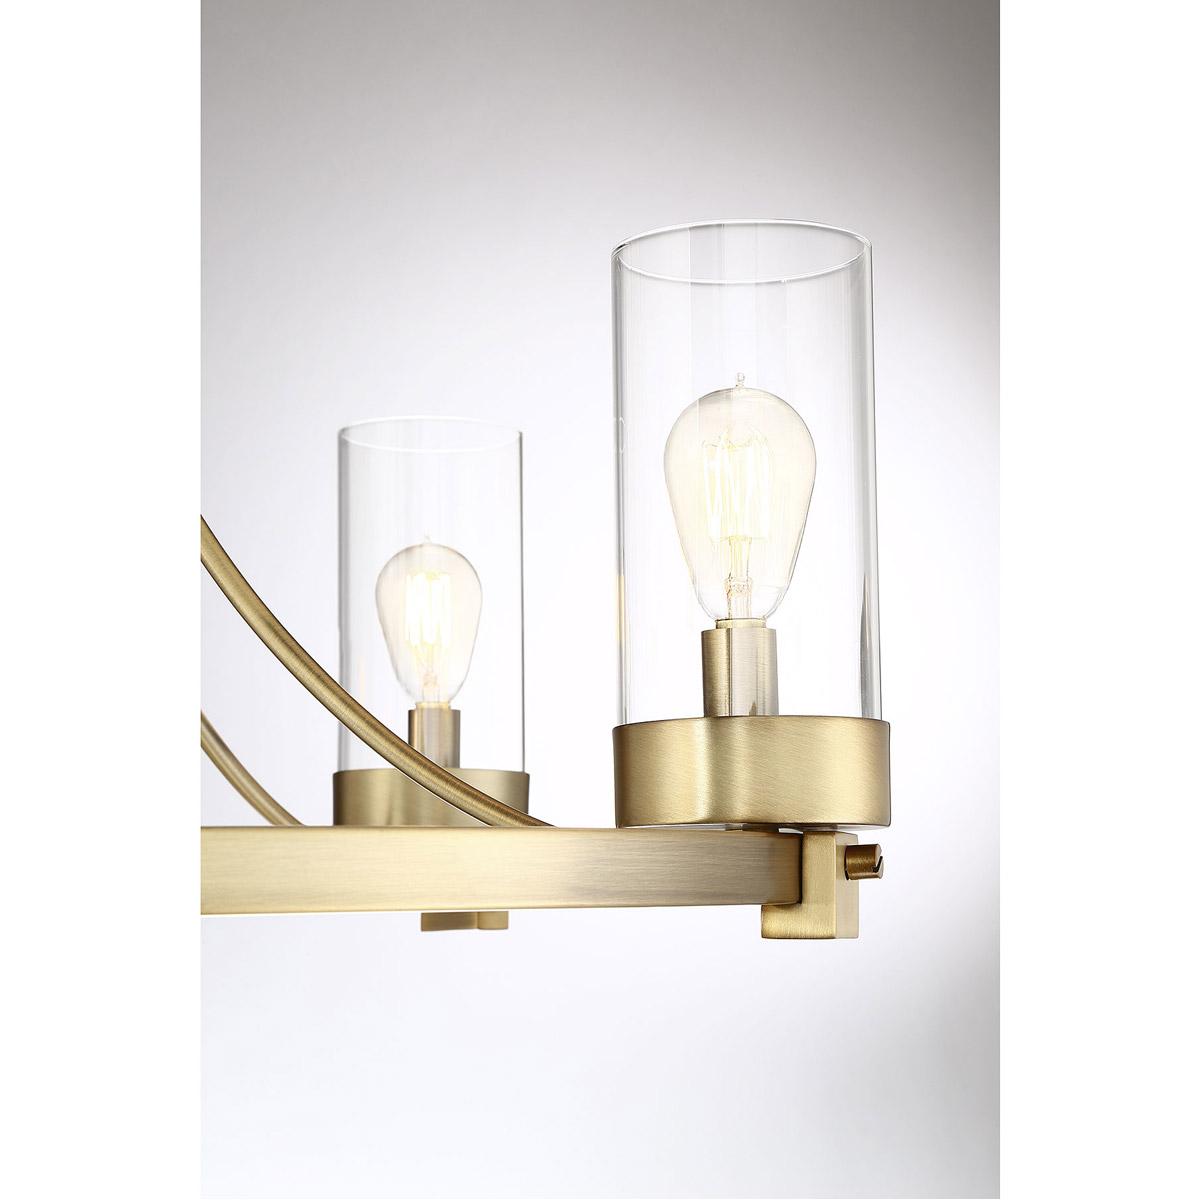 Light Visions Pl0030orb Industrial Bathroom Vanity Light Oil Rubbed Bronze Wall Fixtures